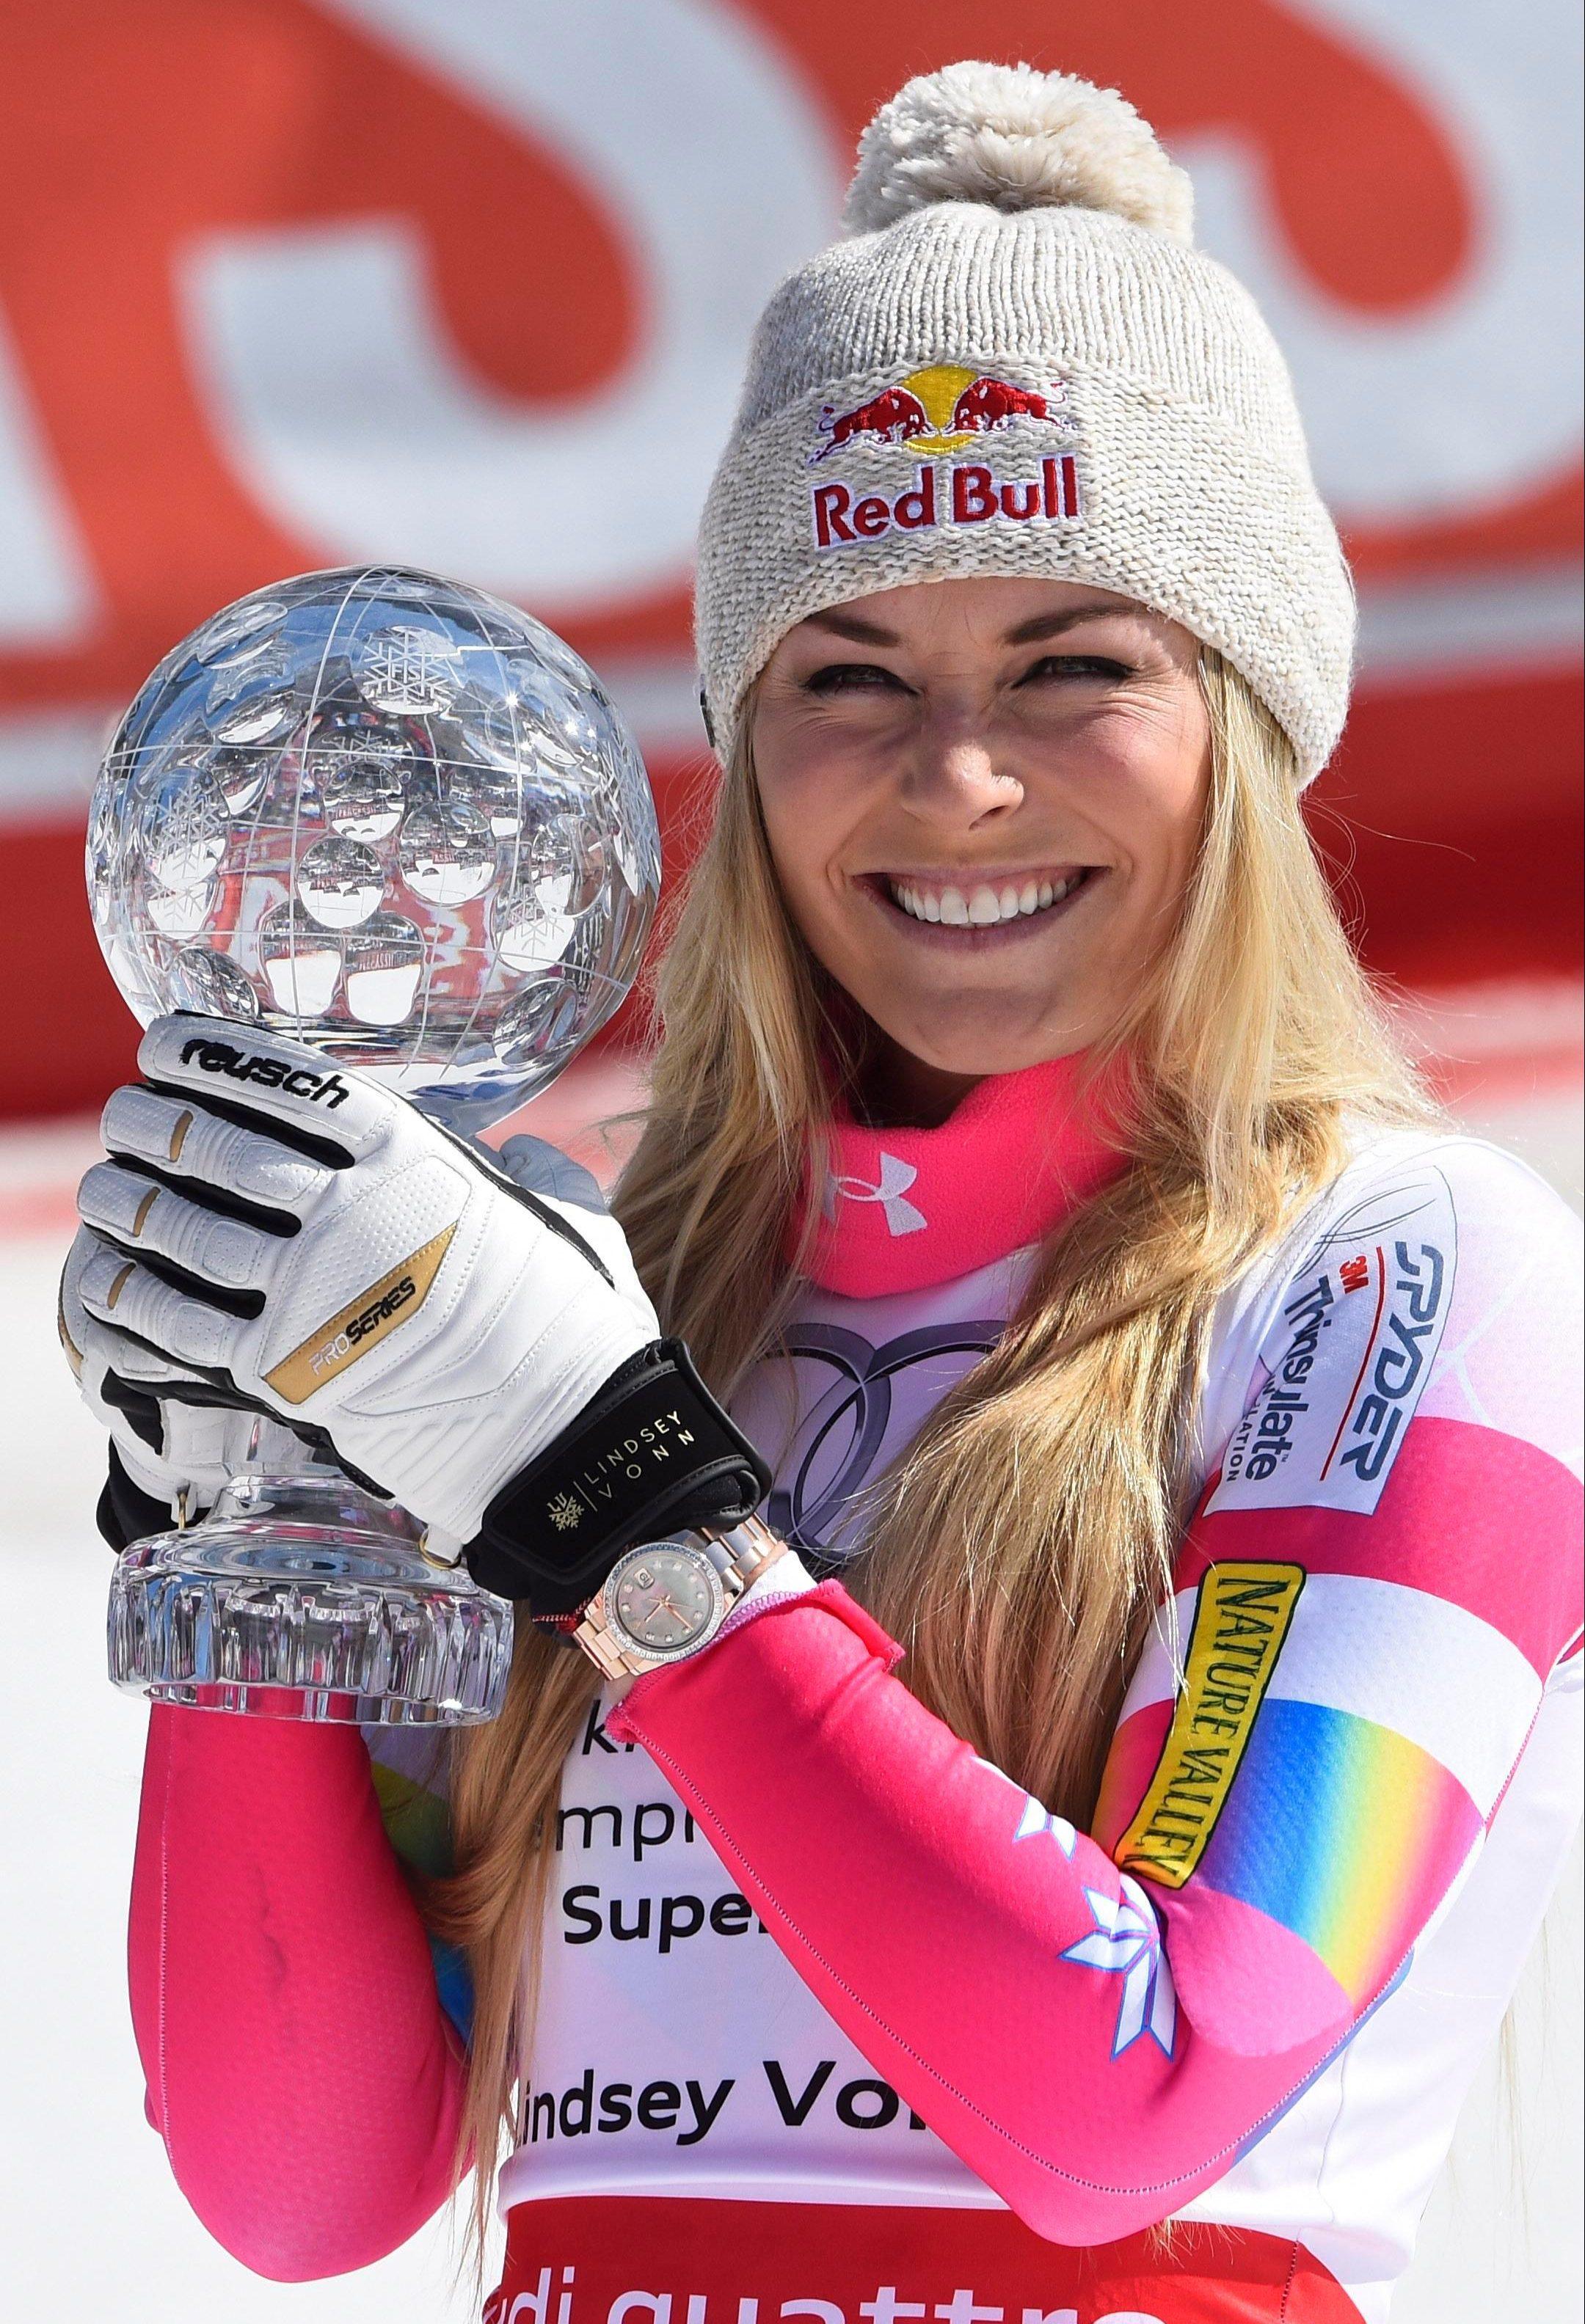 American skier Lindsey Vonn celebrates winning the Super-G